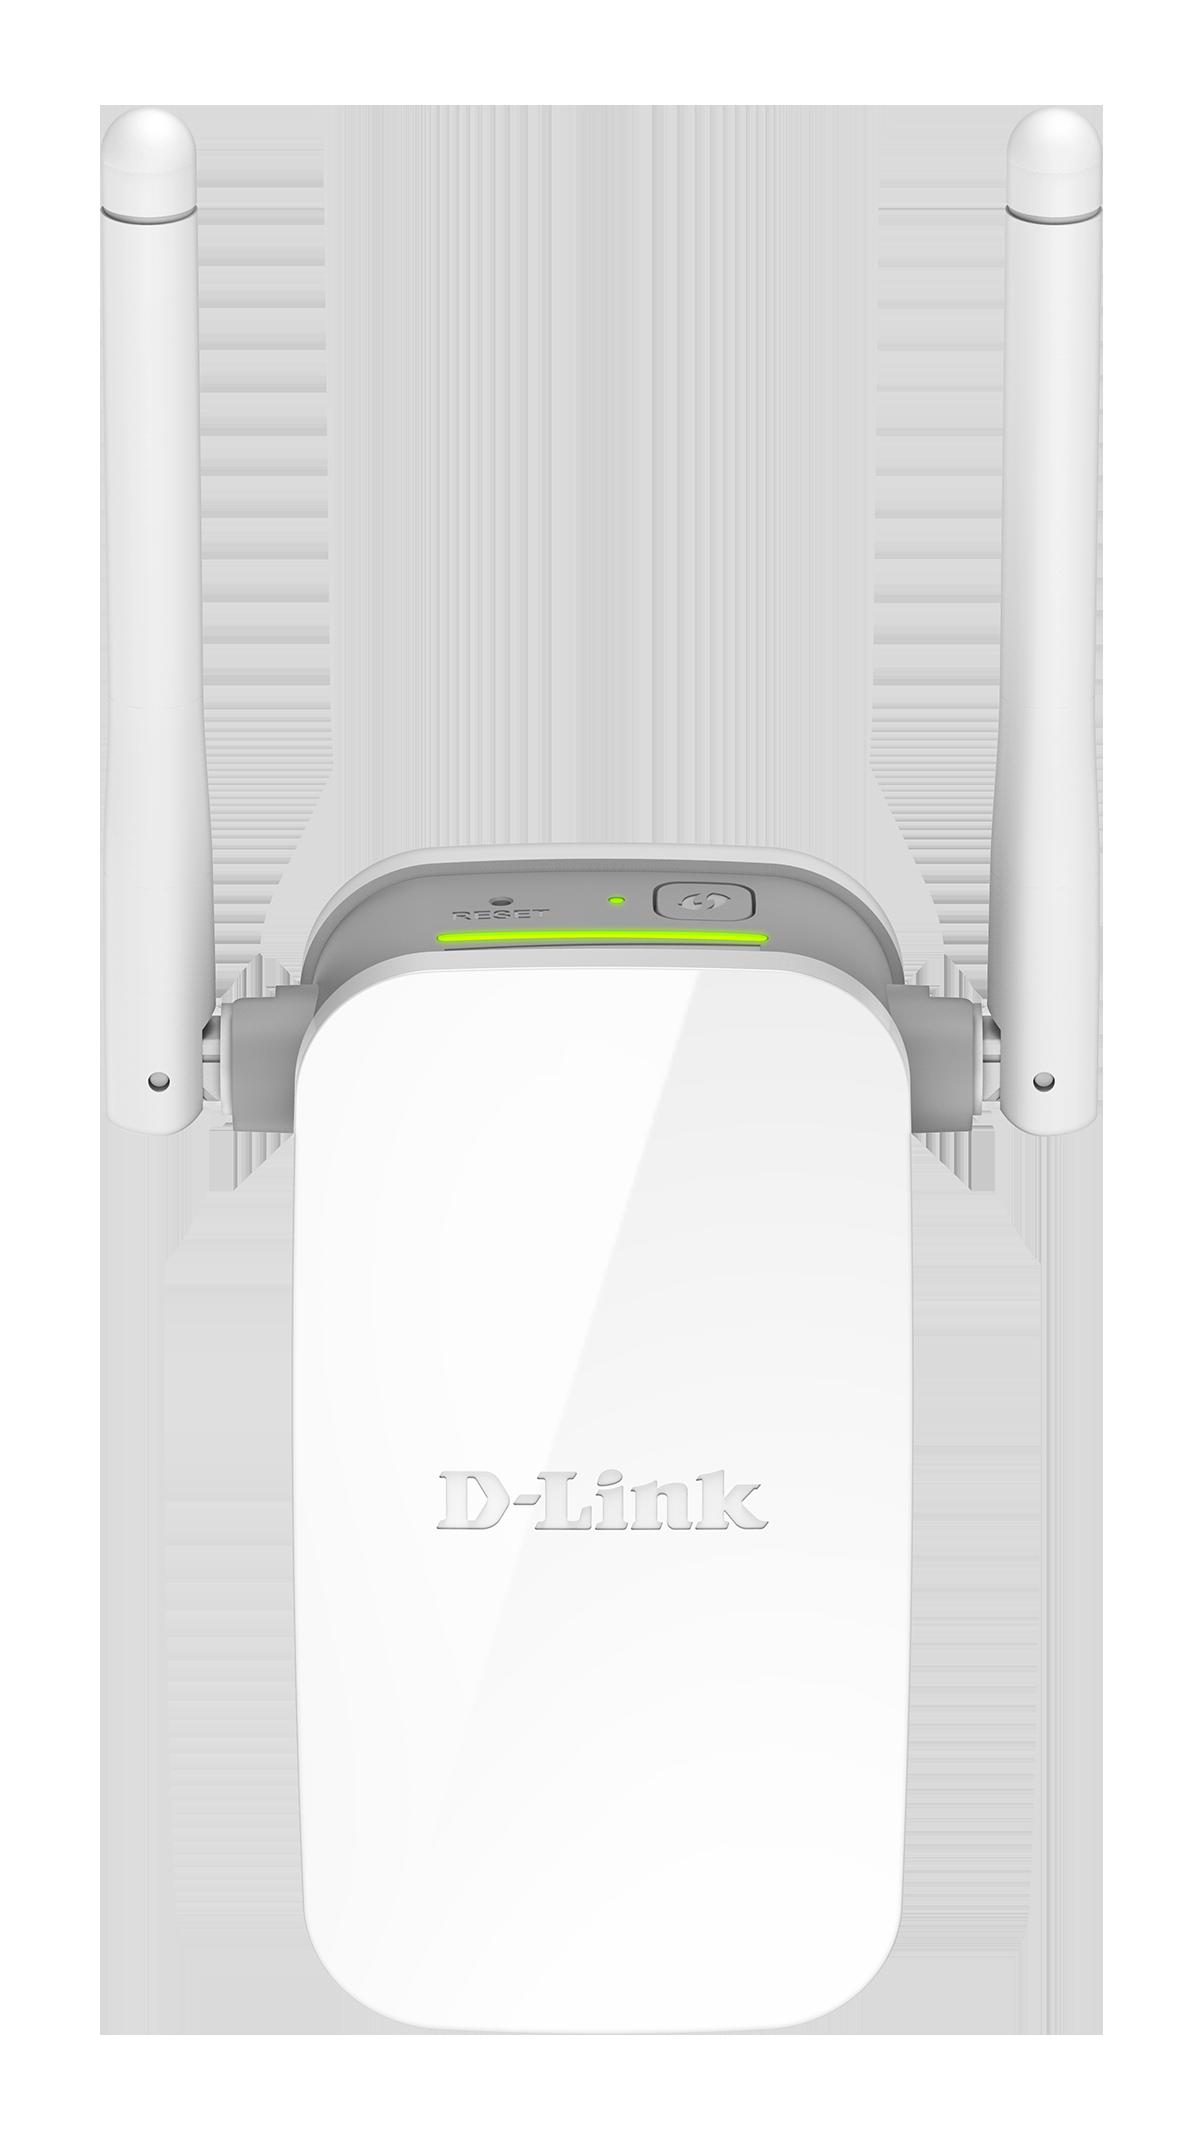 D-Link N300 Wi-Fi Range Extender